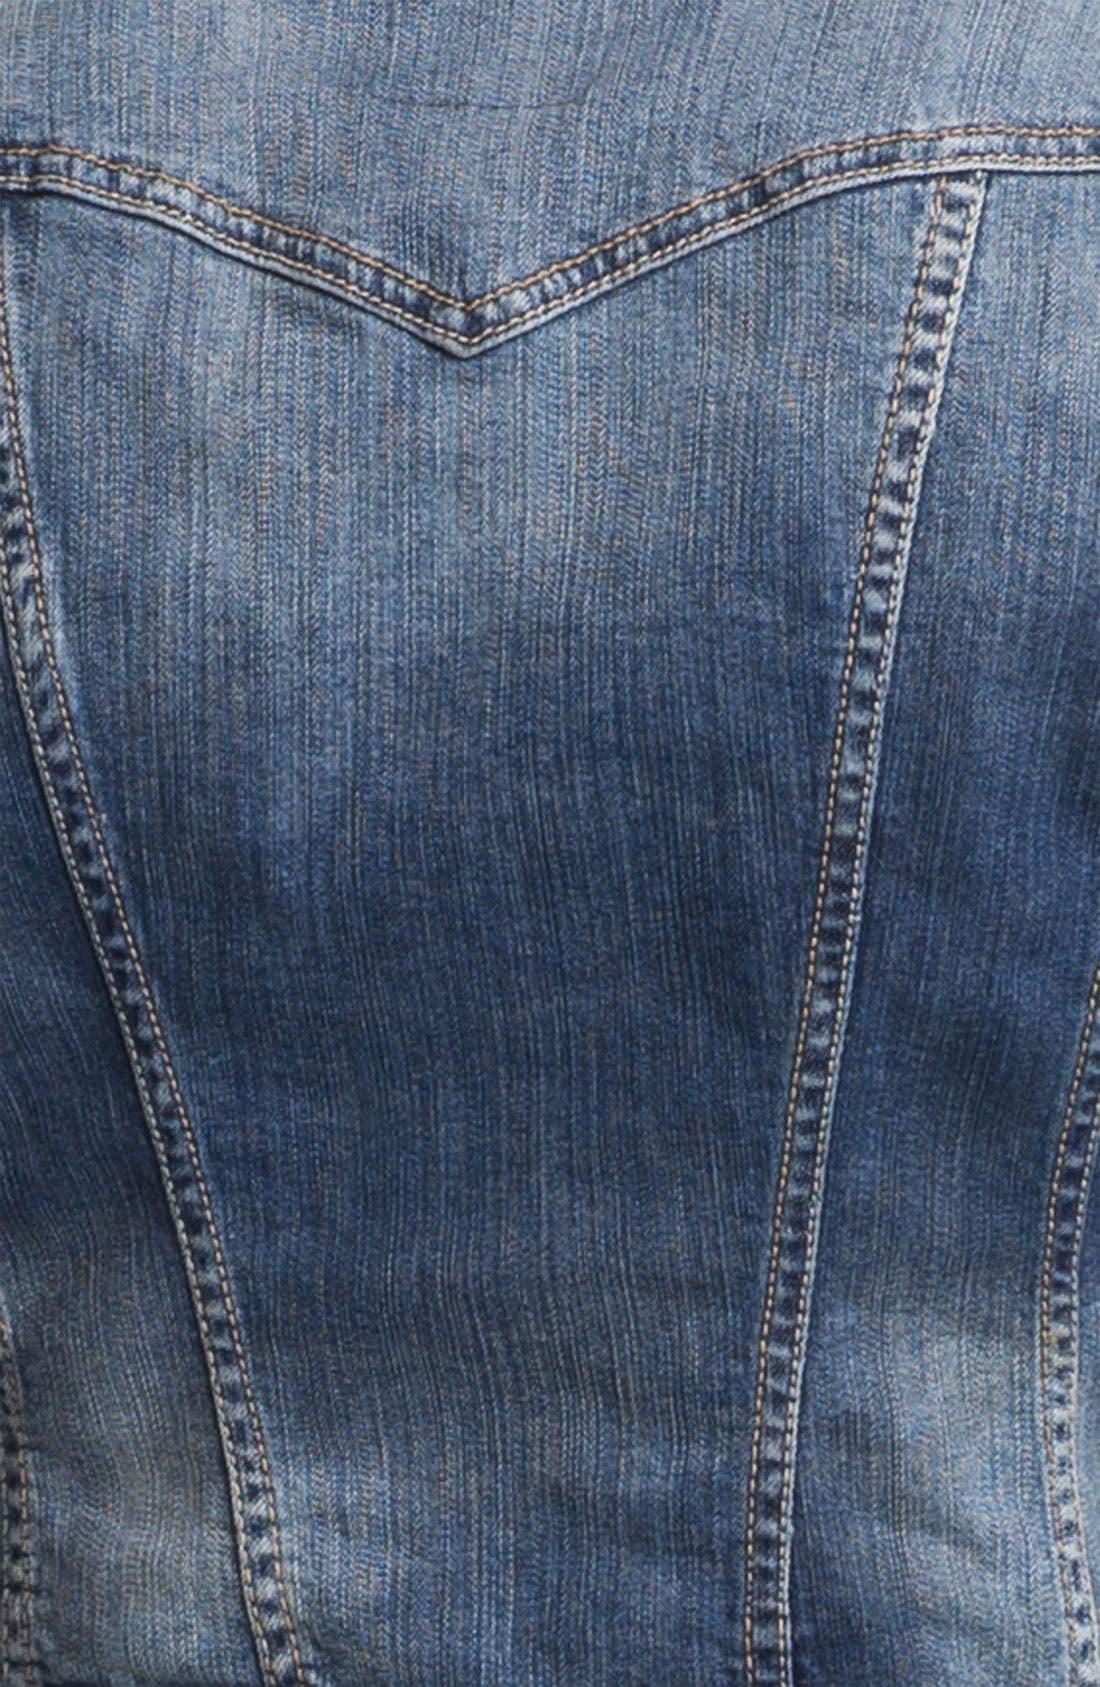 JESSICA SIMPSON,                             'Pixie' Denim Jacket,                             Alternate thumbnail 3, color,                             400